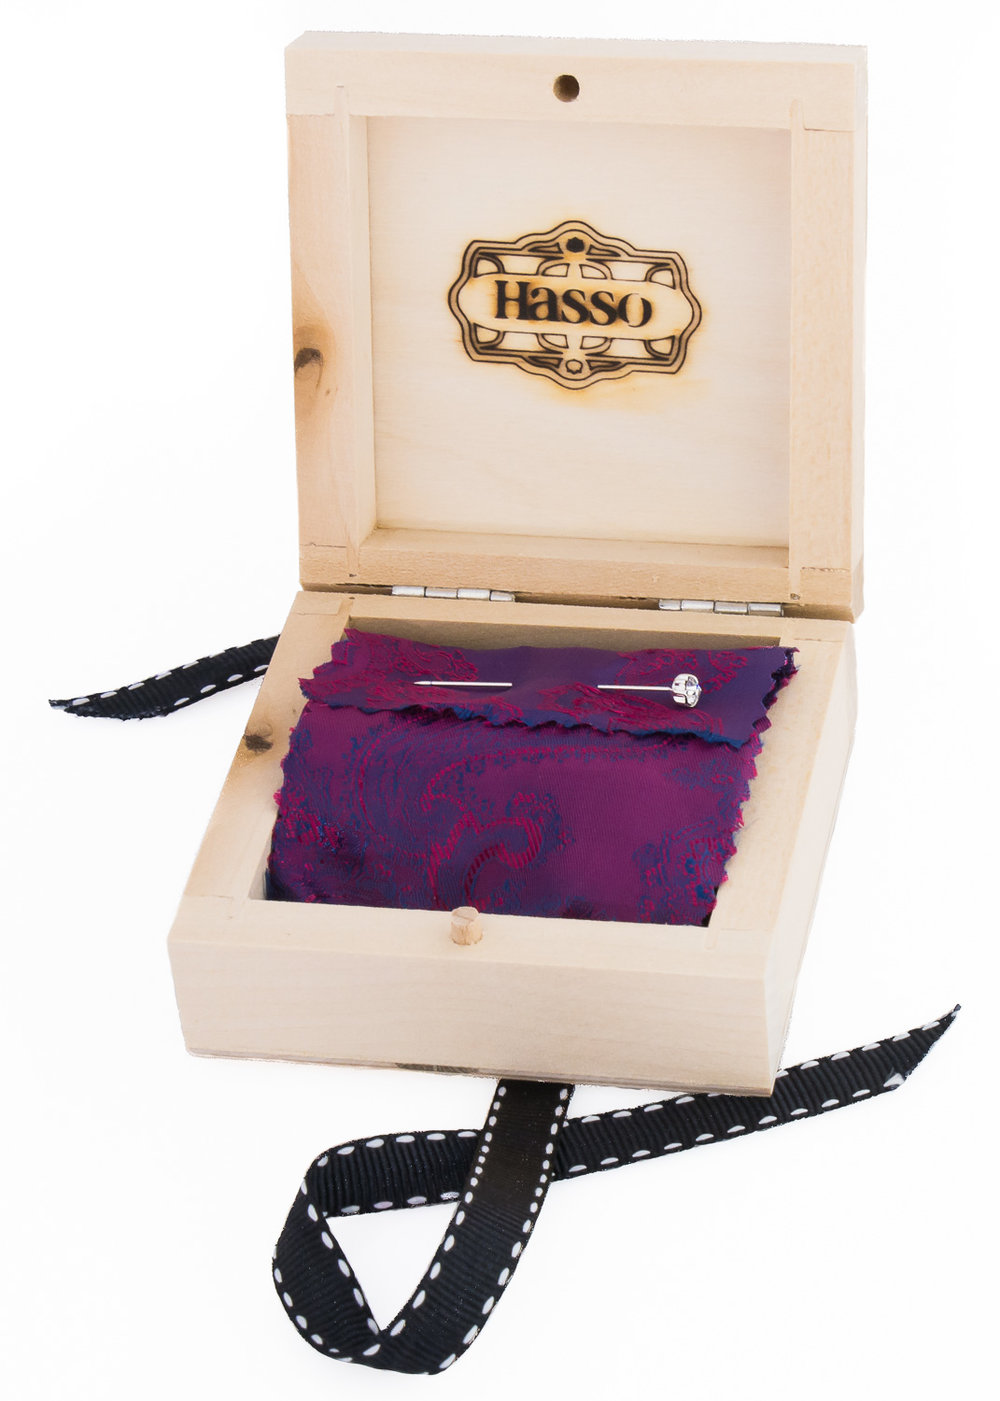 hasso-cufflink-box-open